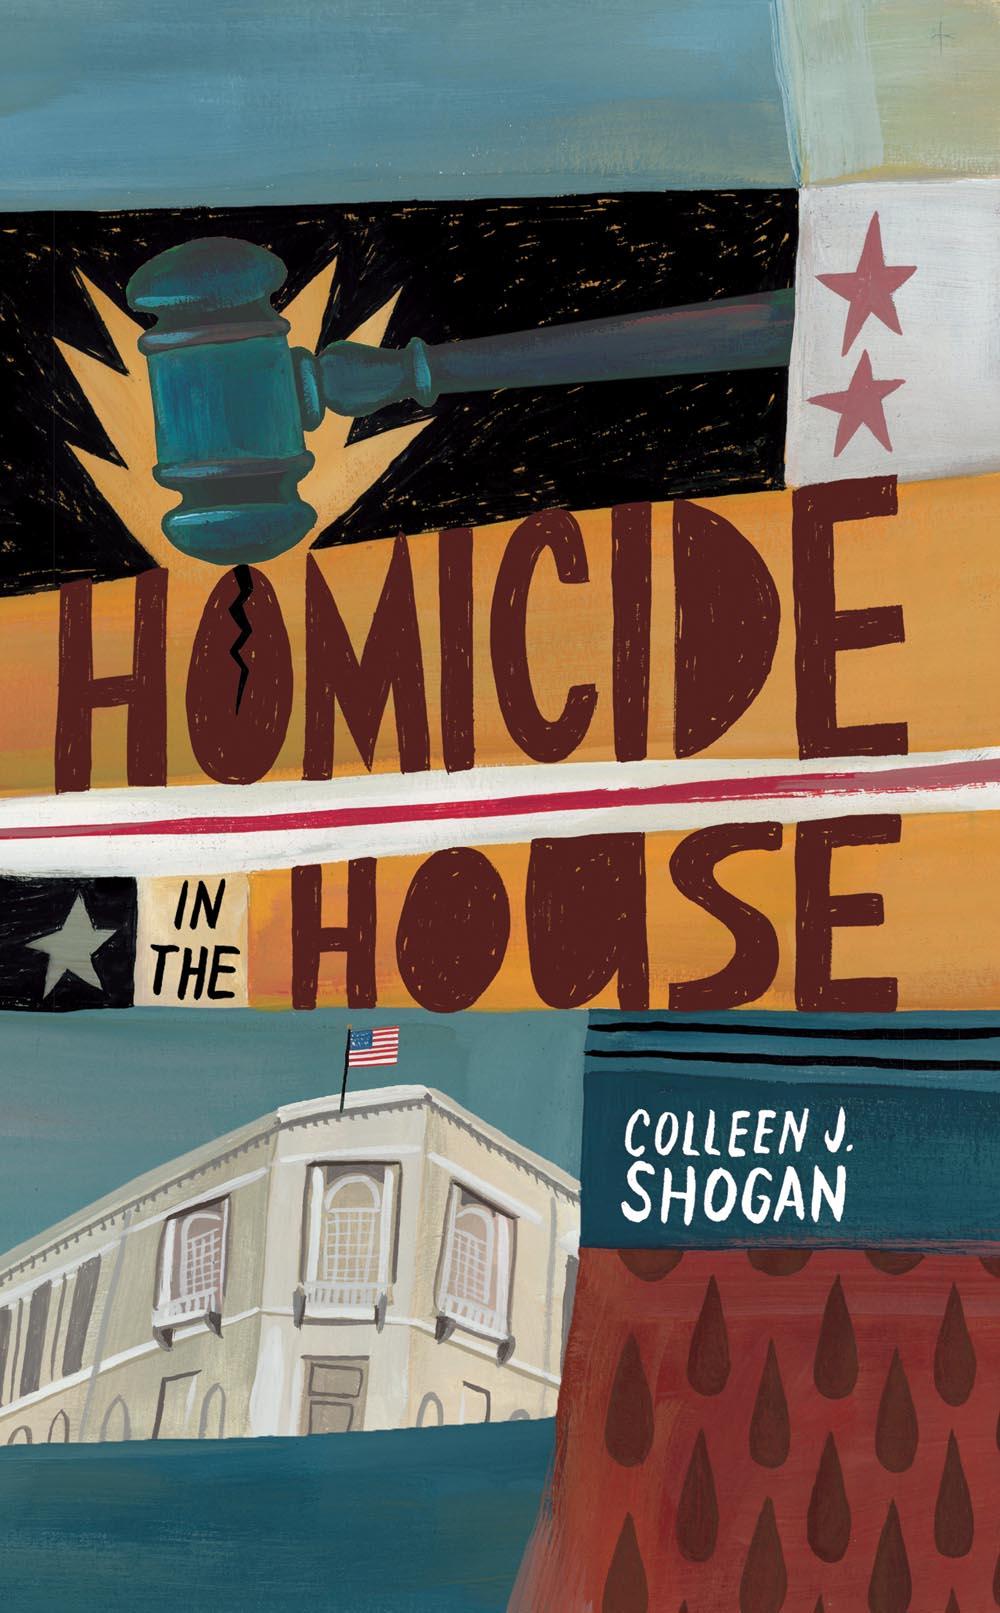 ©Mark Hoffmann illustration Homicide in the House